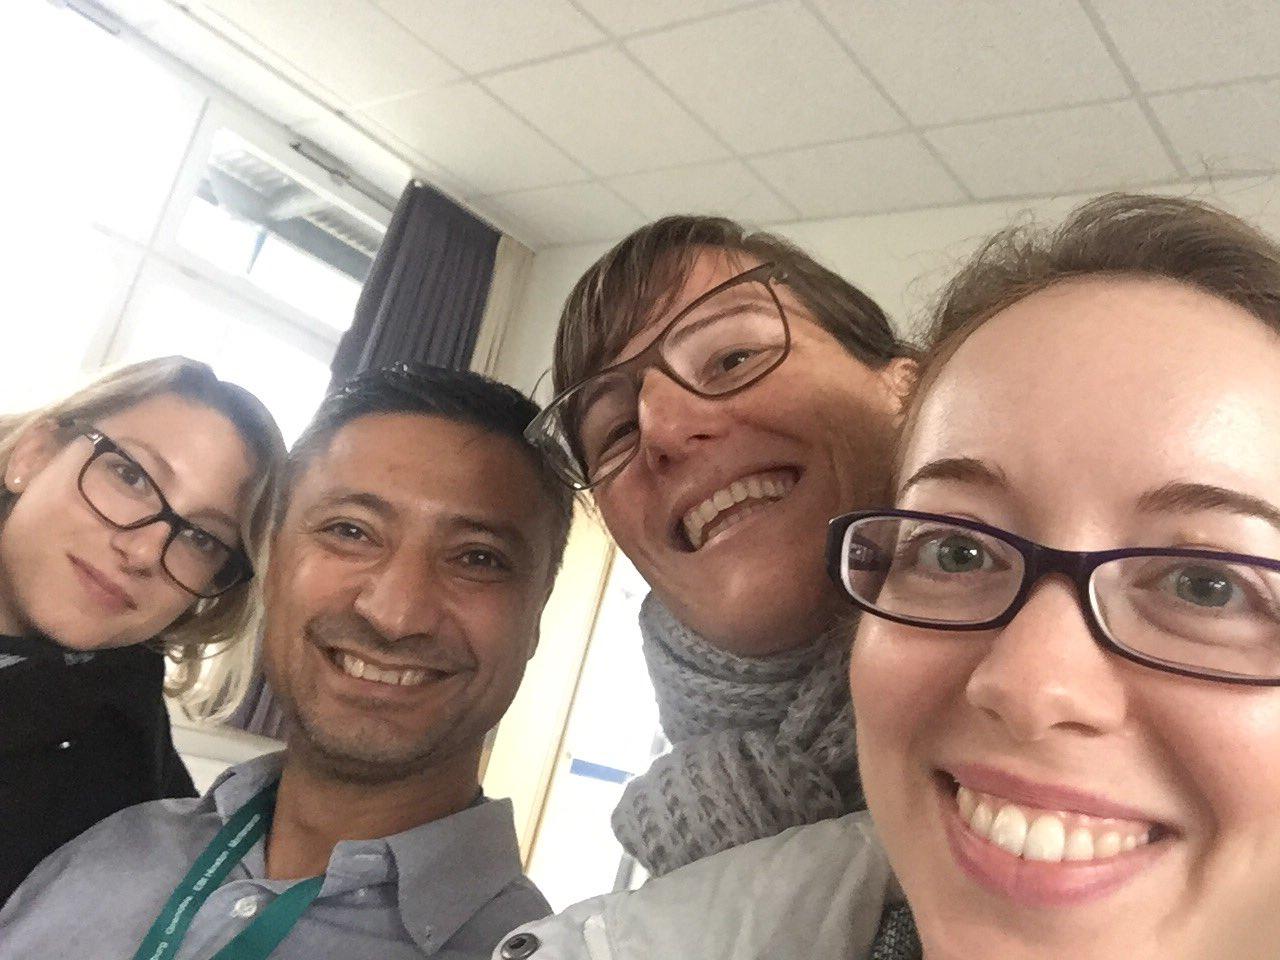 #happypeople at @ELLS_Heidelberg #AllSTEMScientix #scienceisfun https://t.co/FXzpy4E4vb